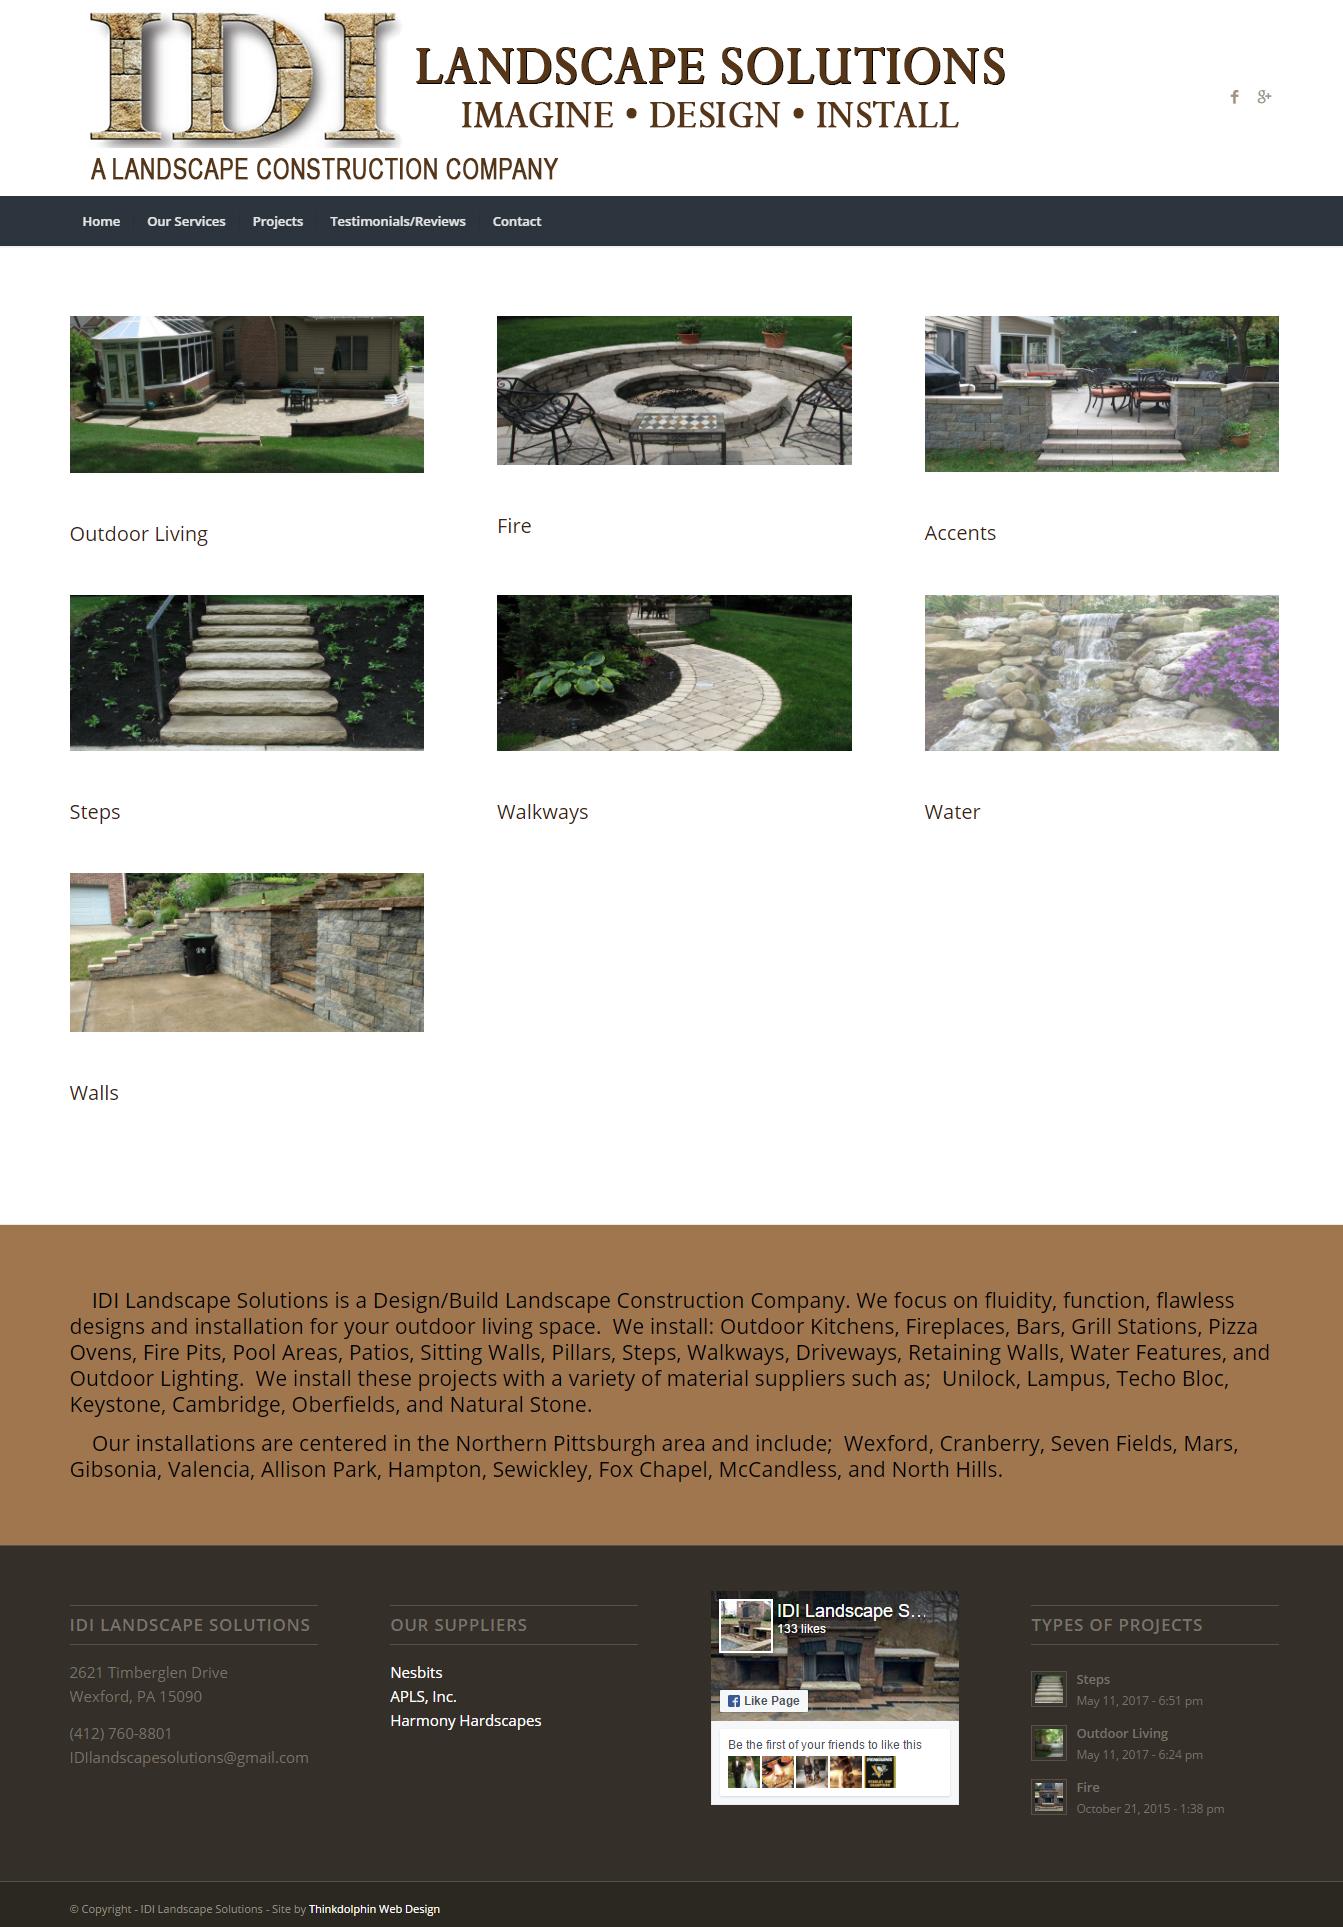 IDI Landscape Solutions